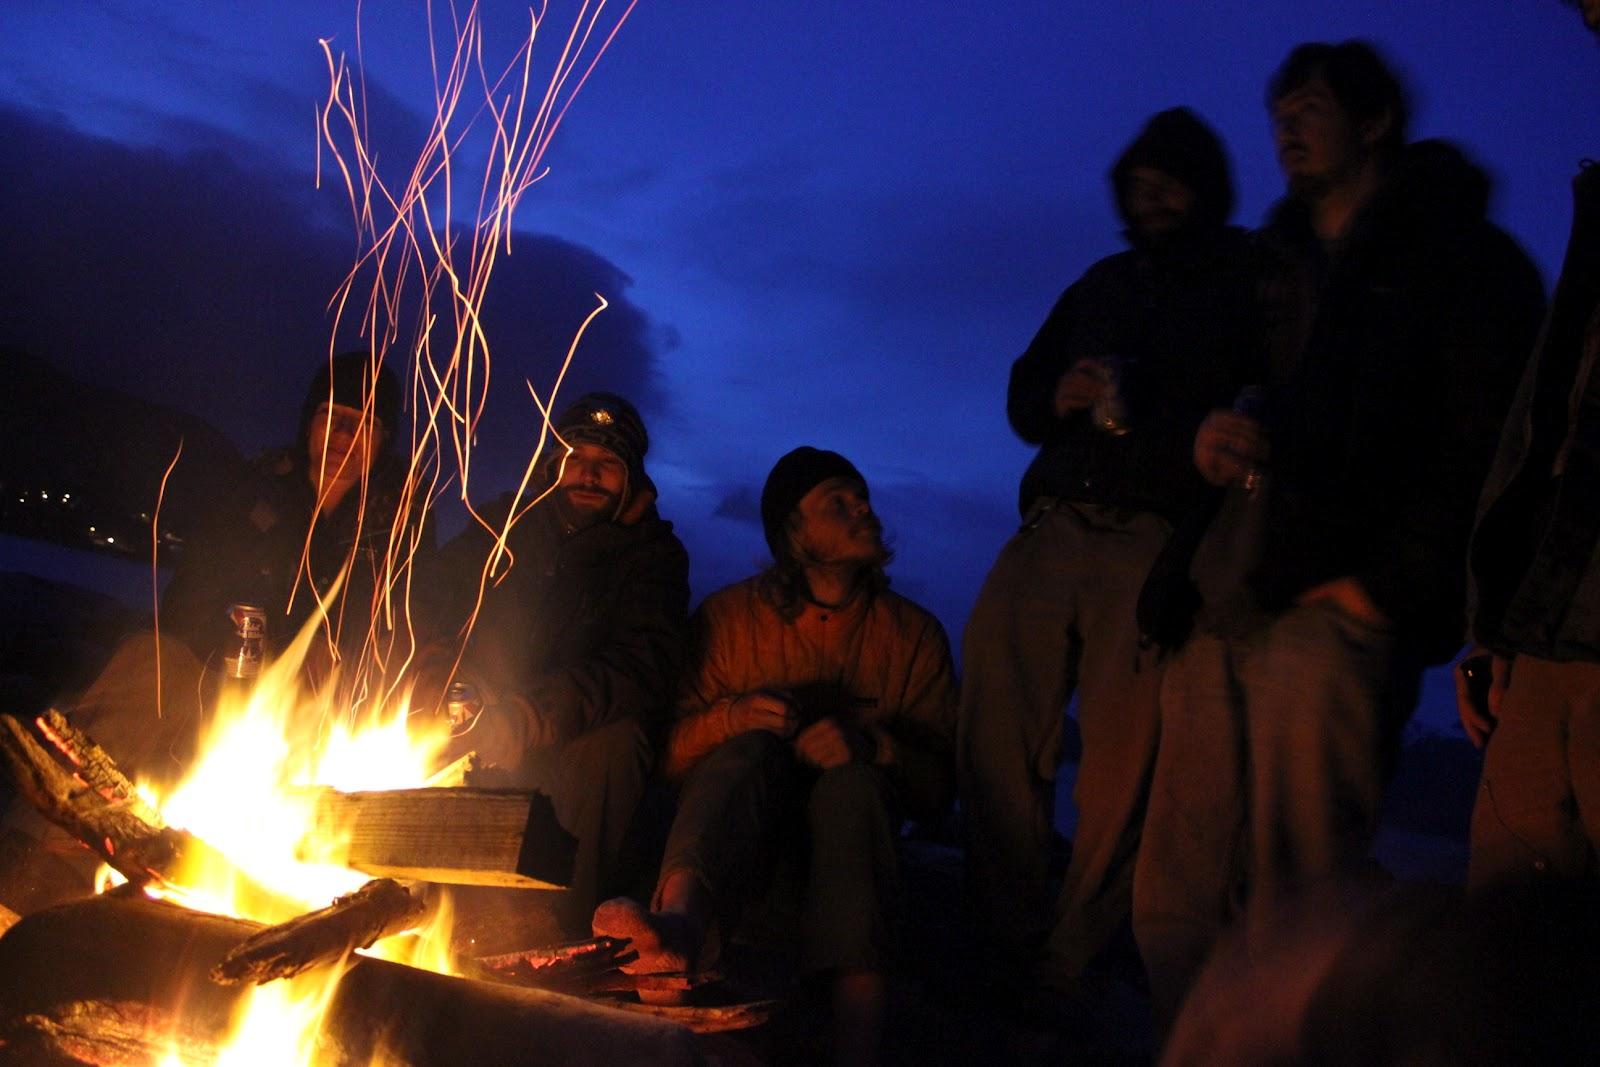 img_7496-jpg.46774_Preparing for Winter in Alaska :: Rose Hips :: Dried Seaweed_Wilderness Survival_Squat the Planet_3:33 PM